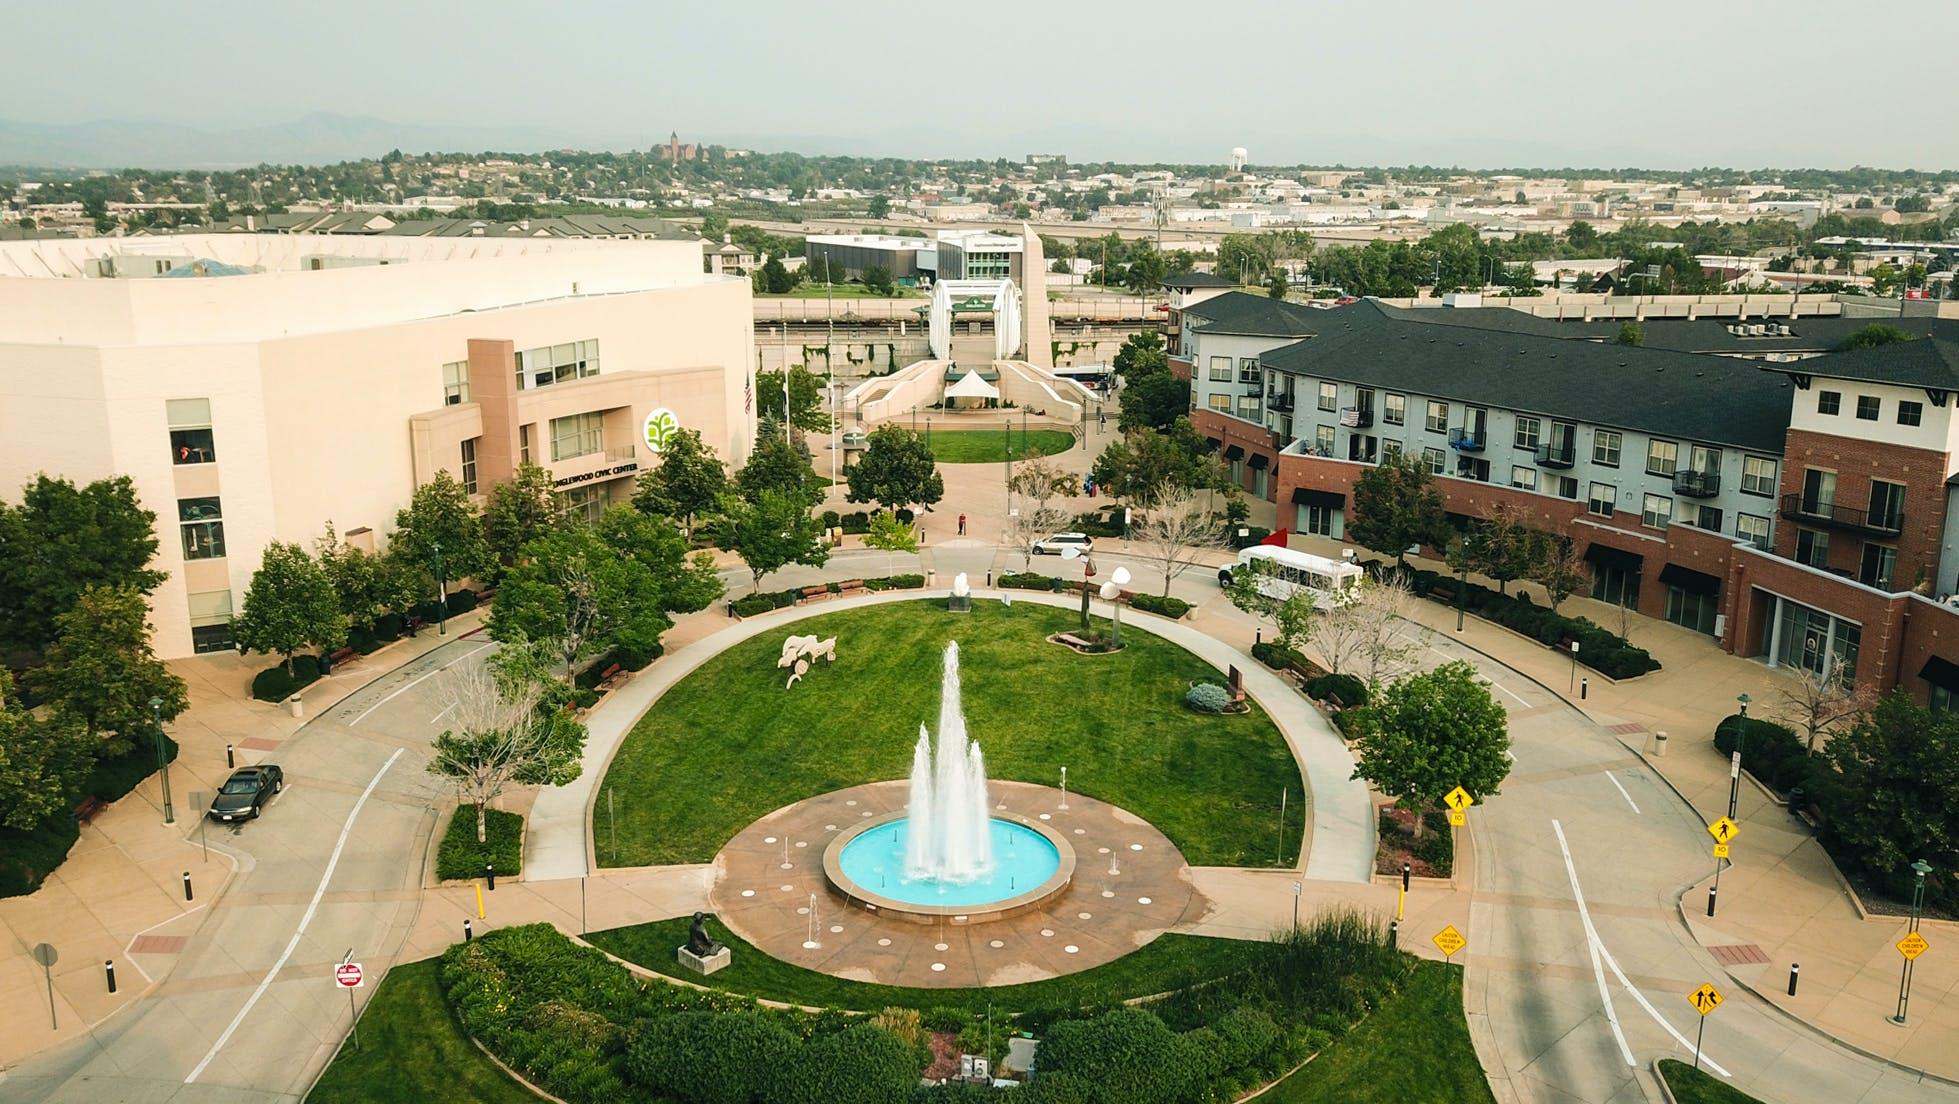 Civic Center Aerial_2.jpg